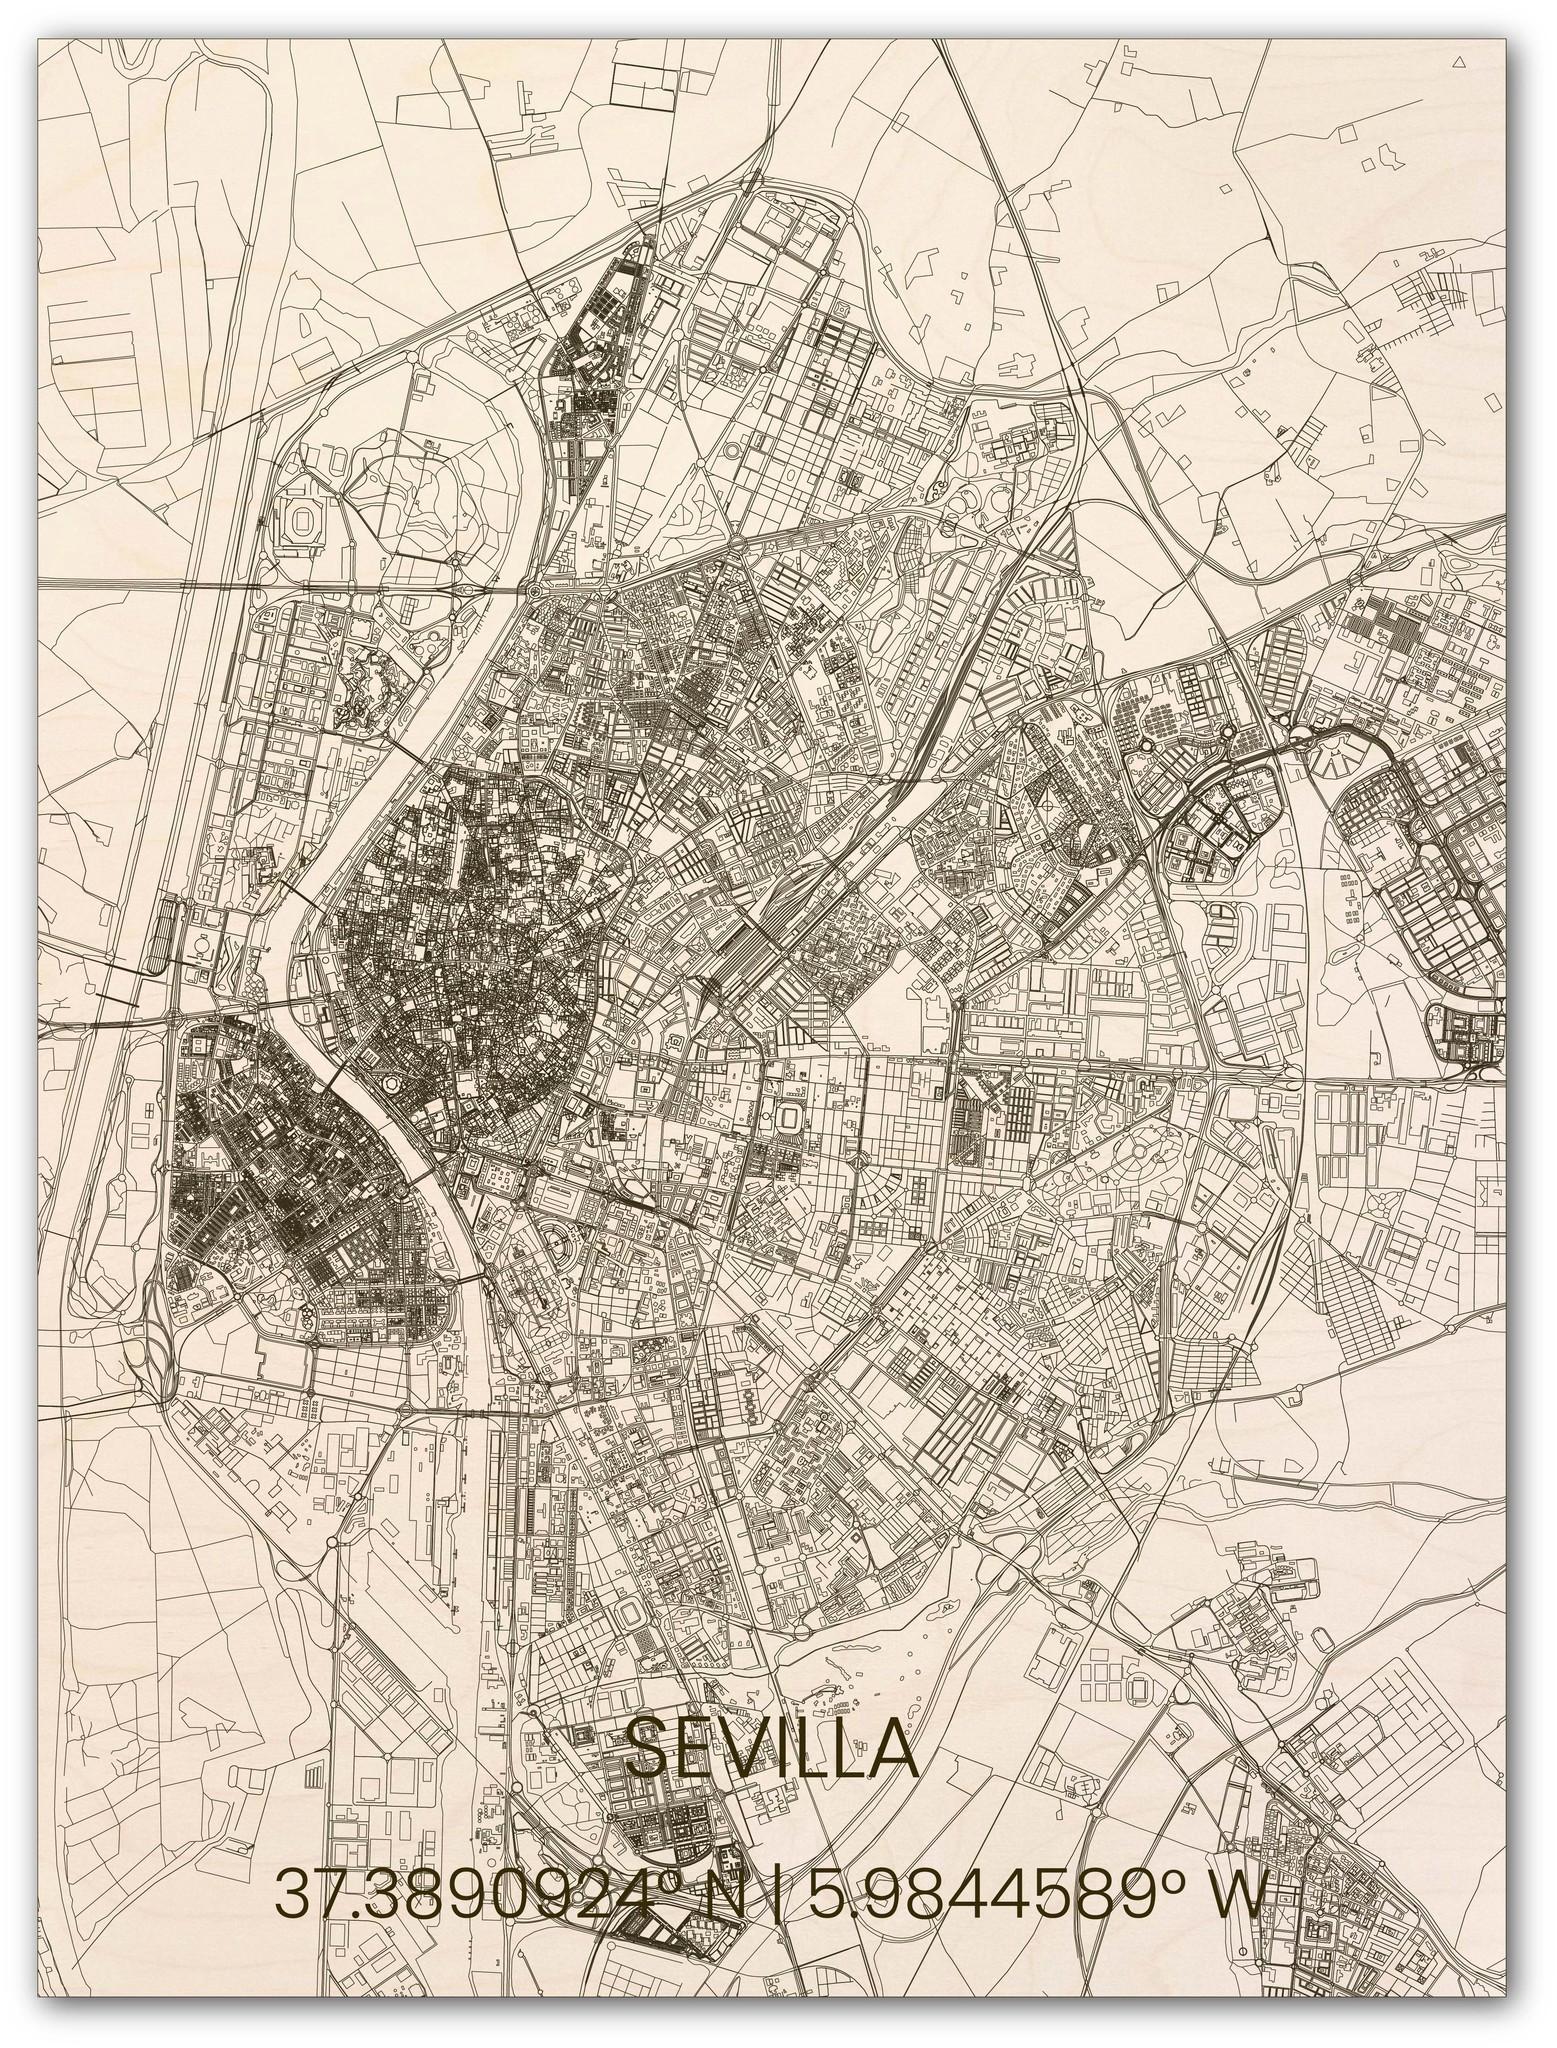 Houten stadsplattegrond Sevilla-1